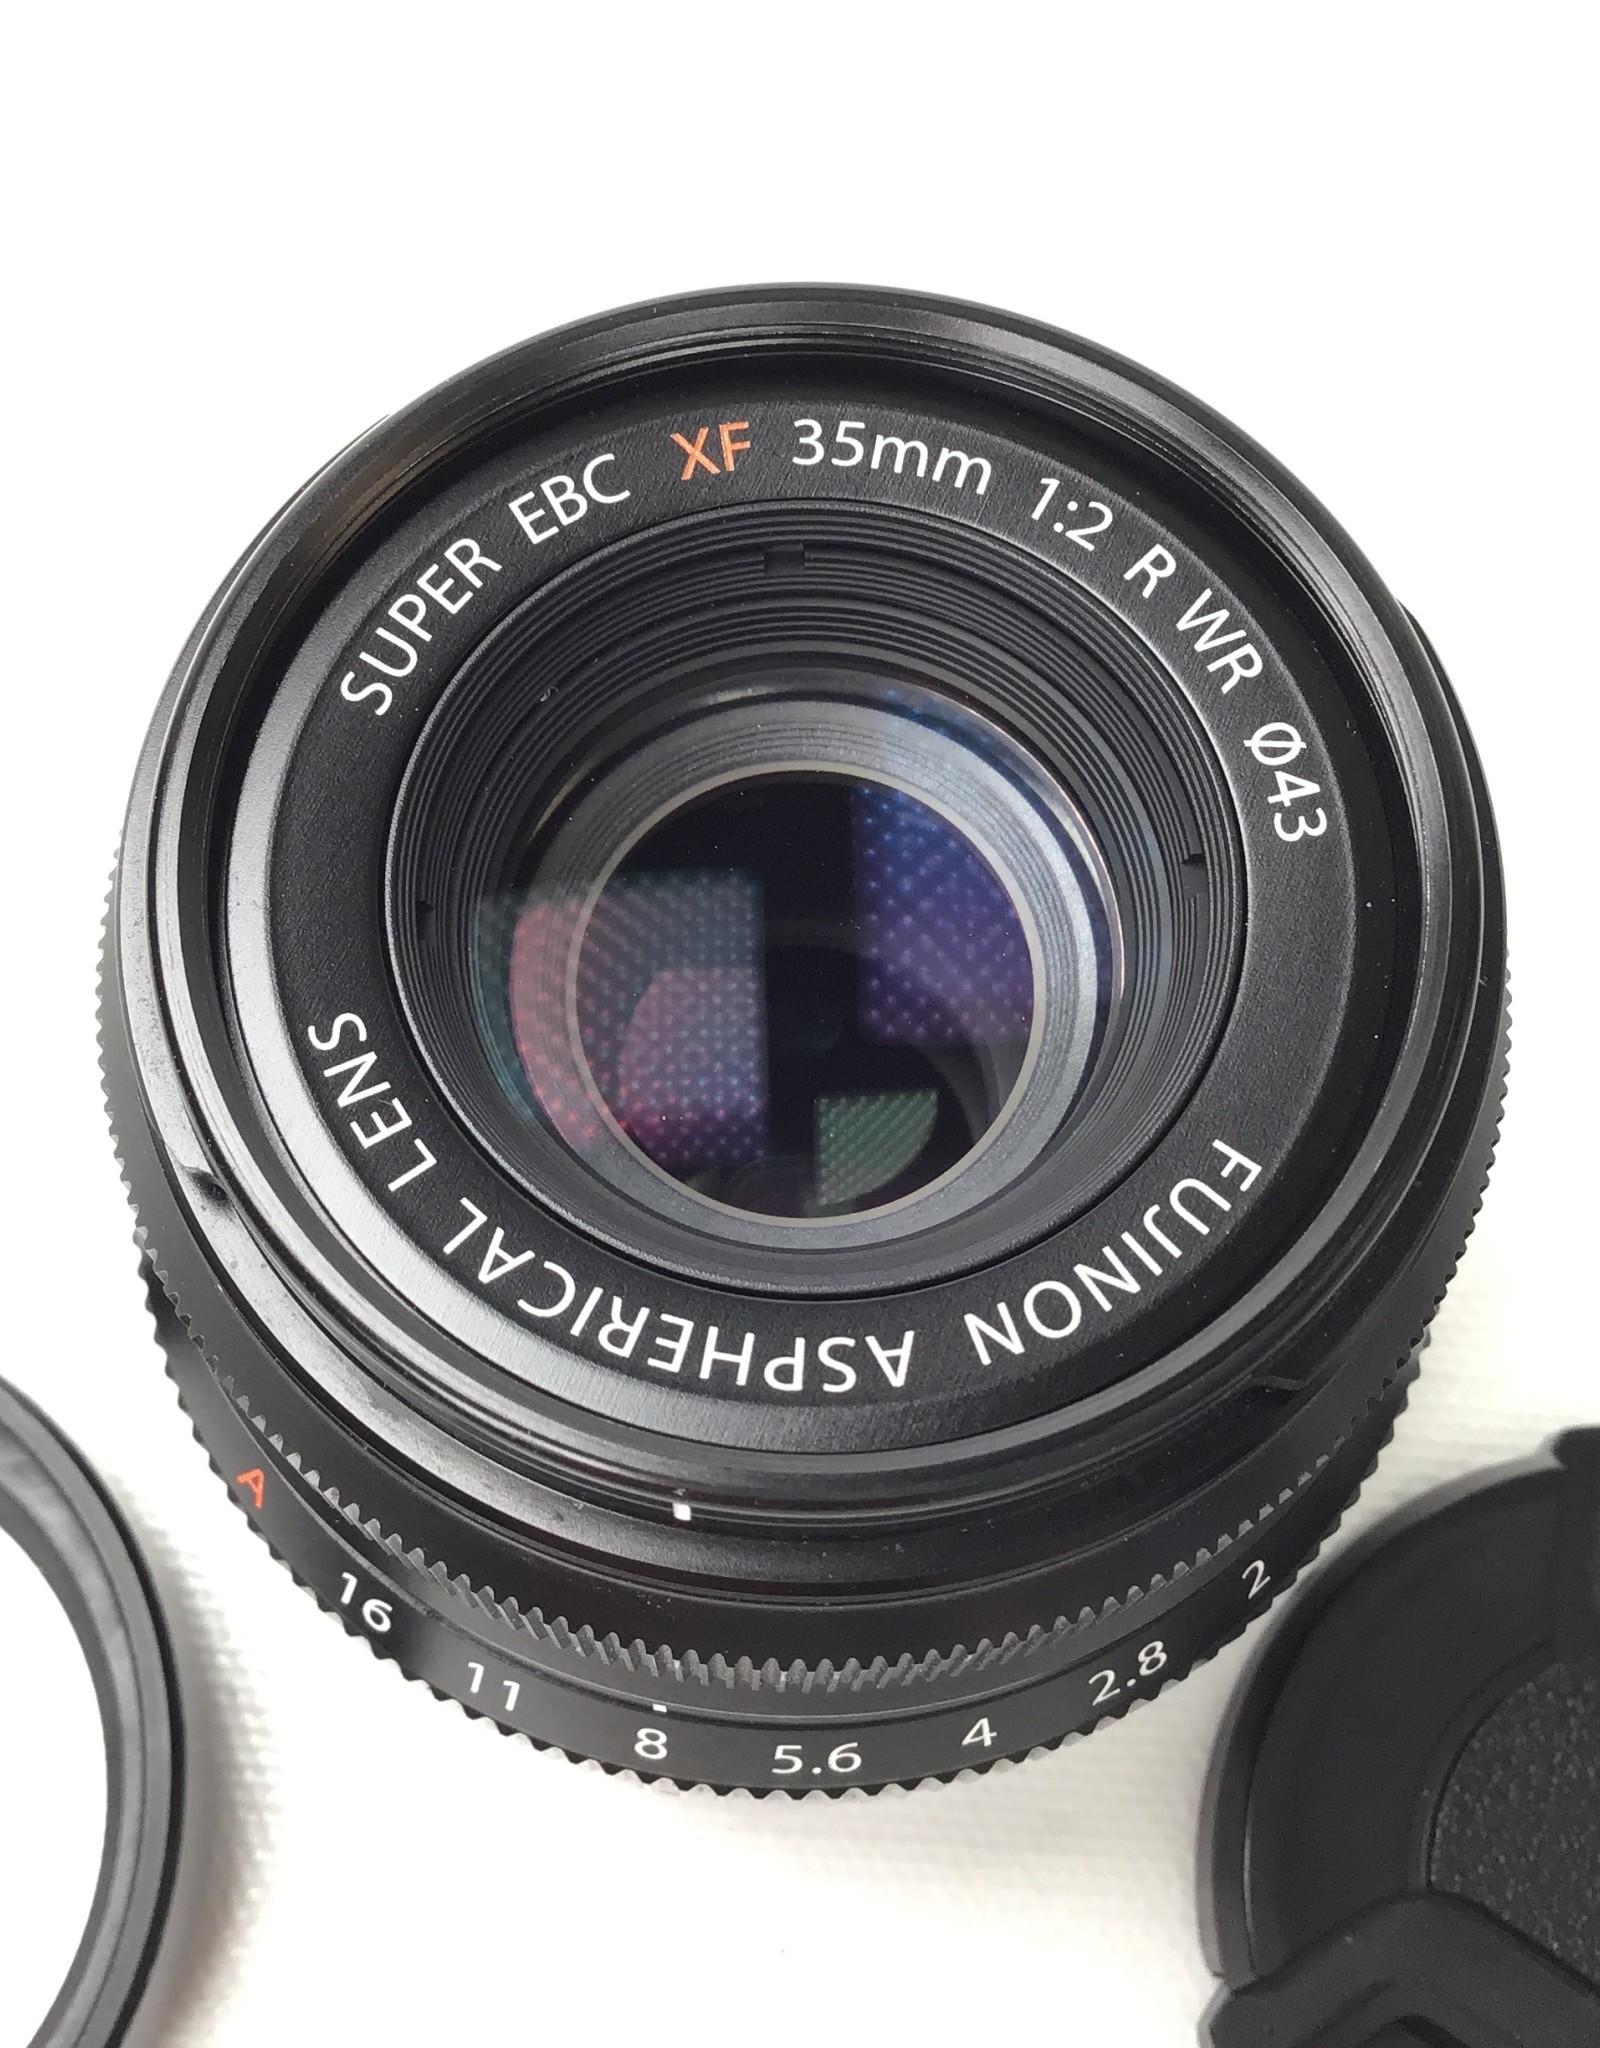 FUJI Fuji Super EBC XF 35mm f2 WR Lens Used EX